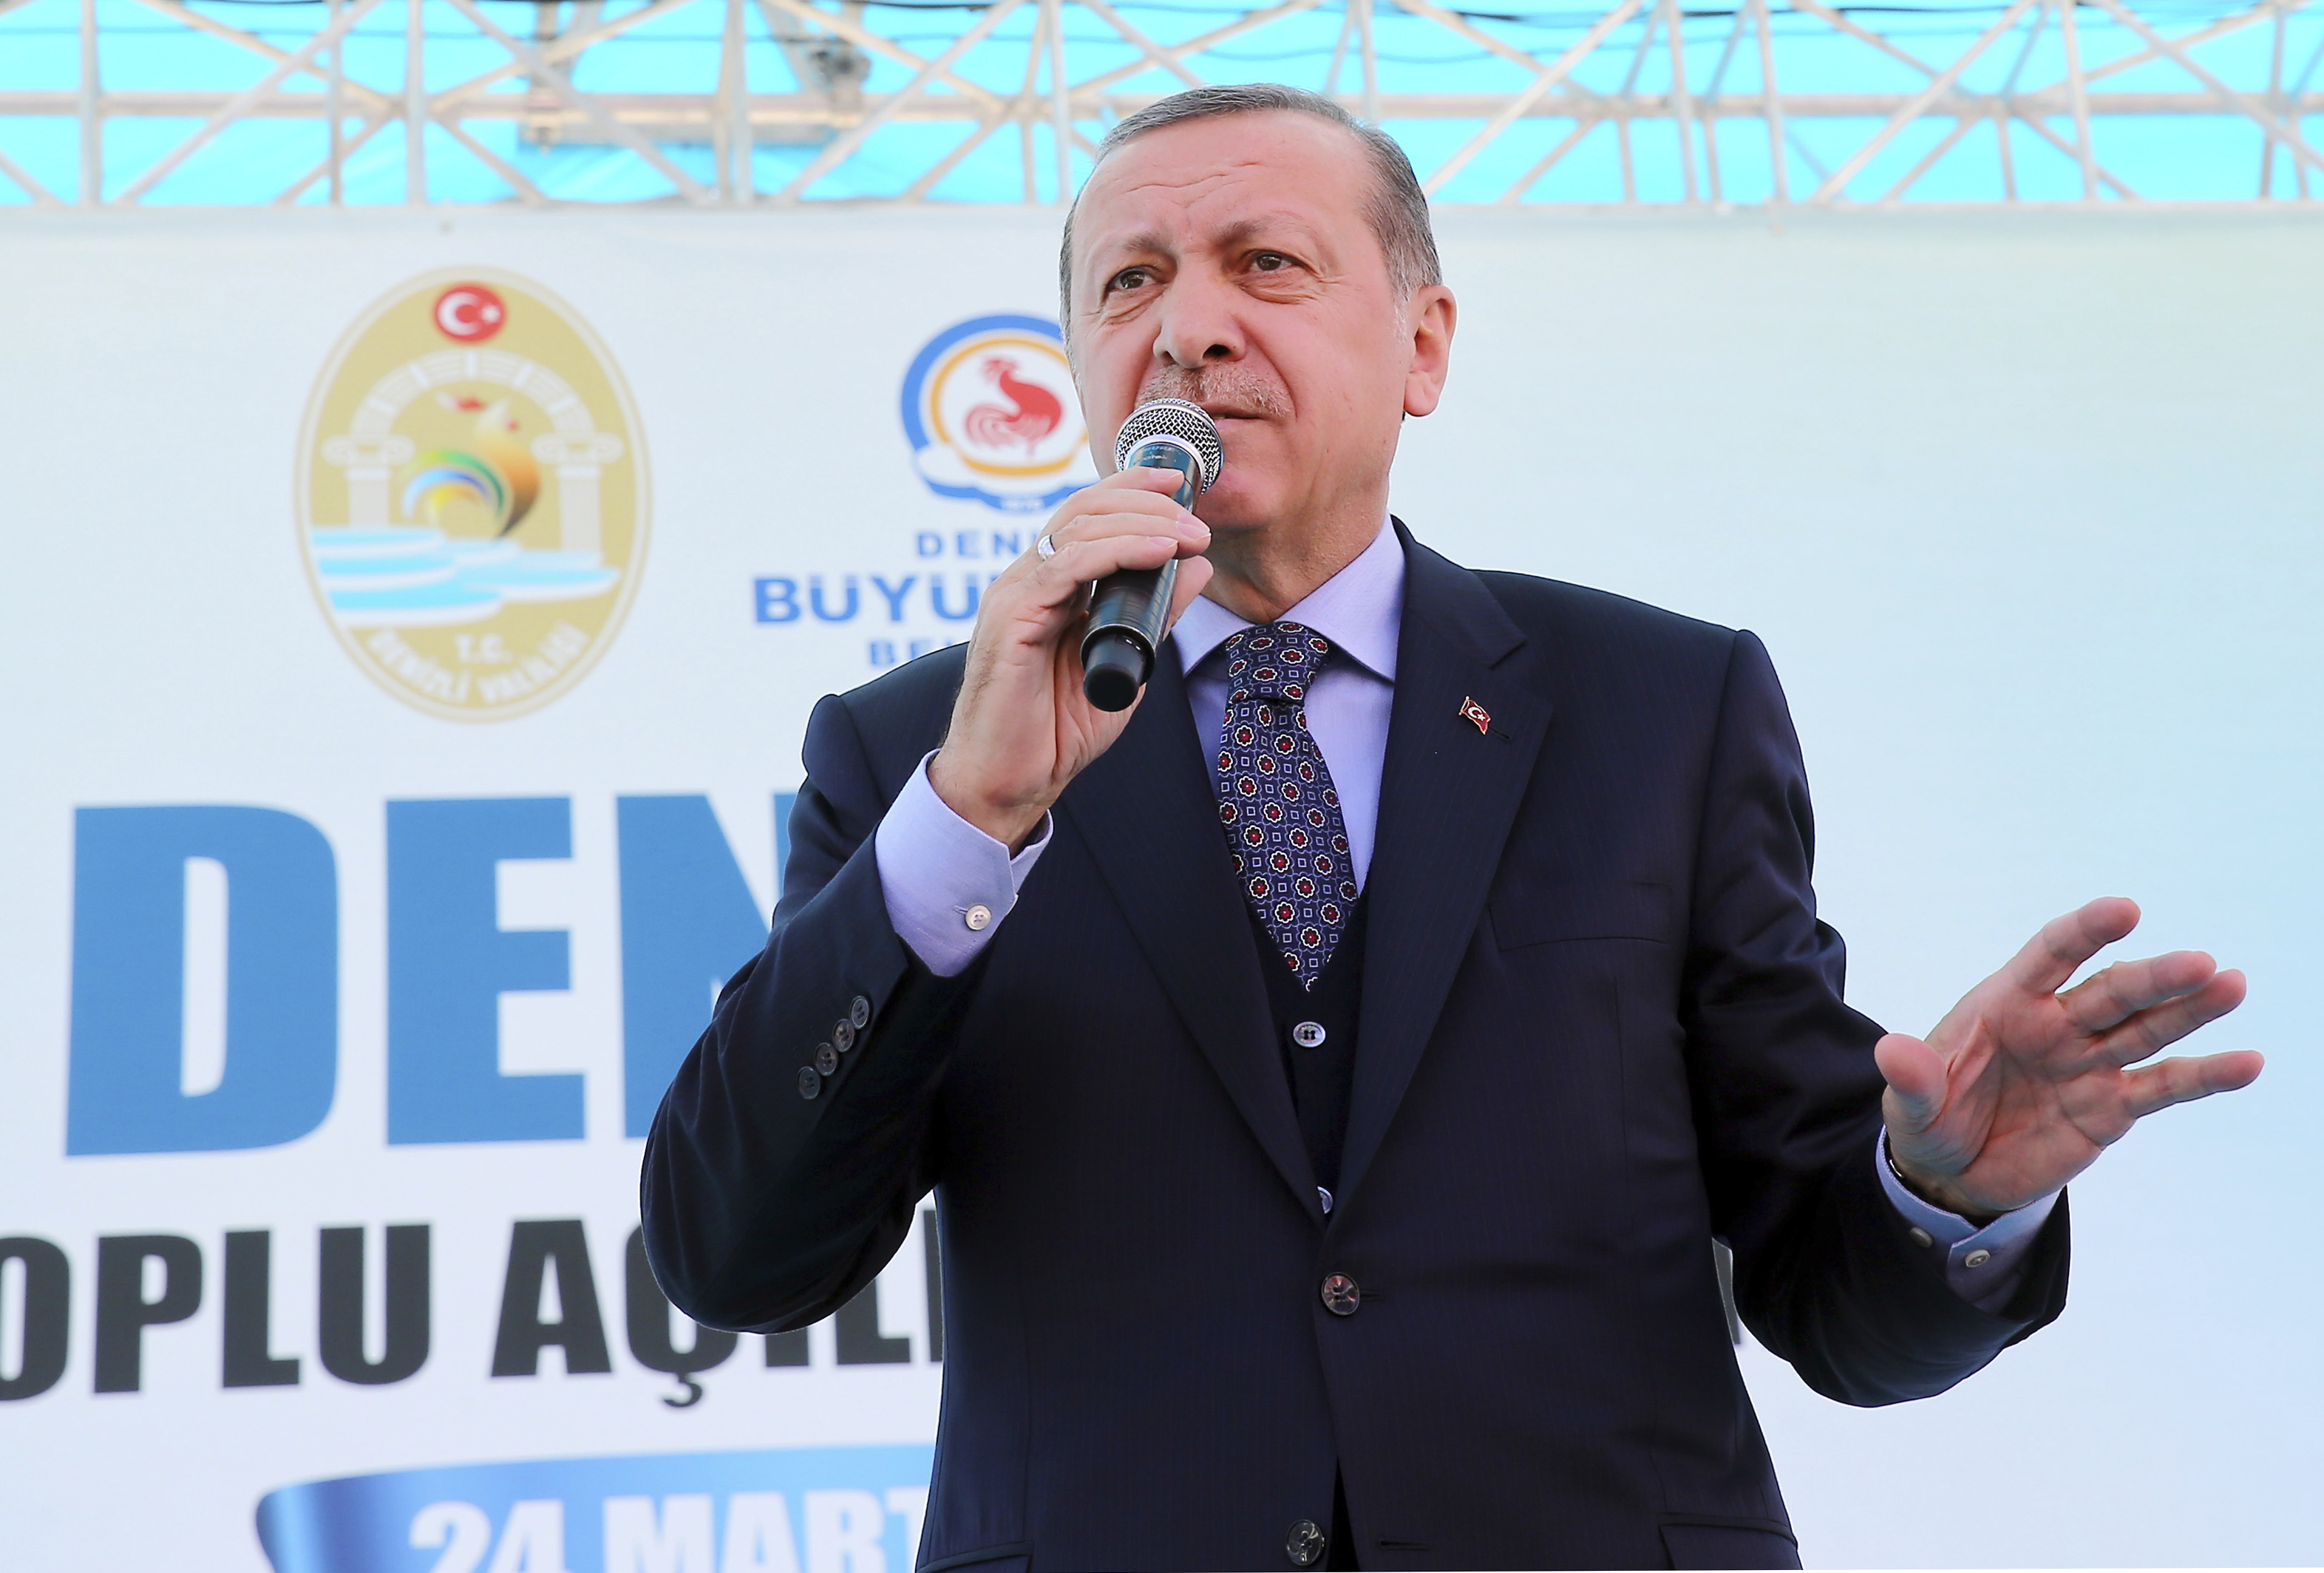 Turkey's President Recep Tayyip Erdogan addresses his supporters in Denizli, Turkey on March 24, 2017.(Kayhan Ozer/Presidential Press Service, Pool Photo via AP)